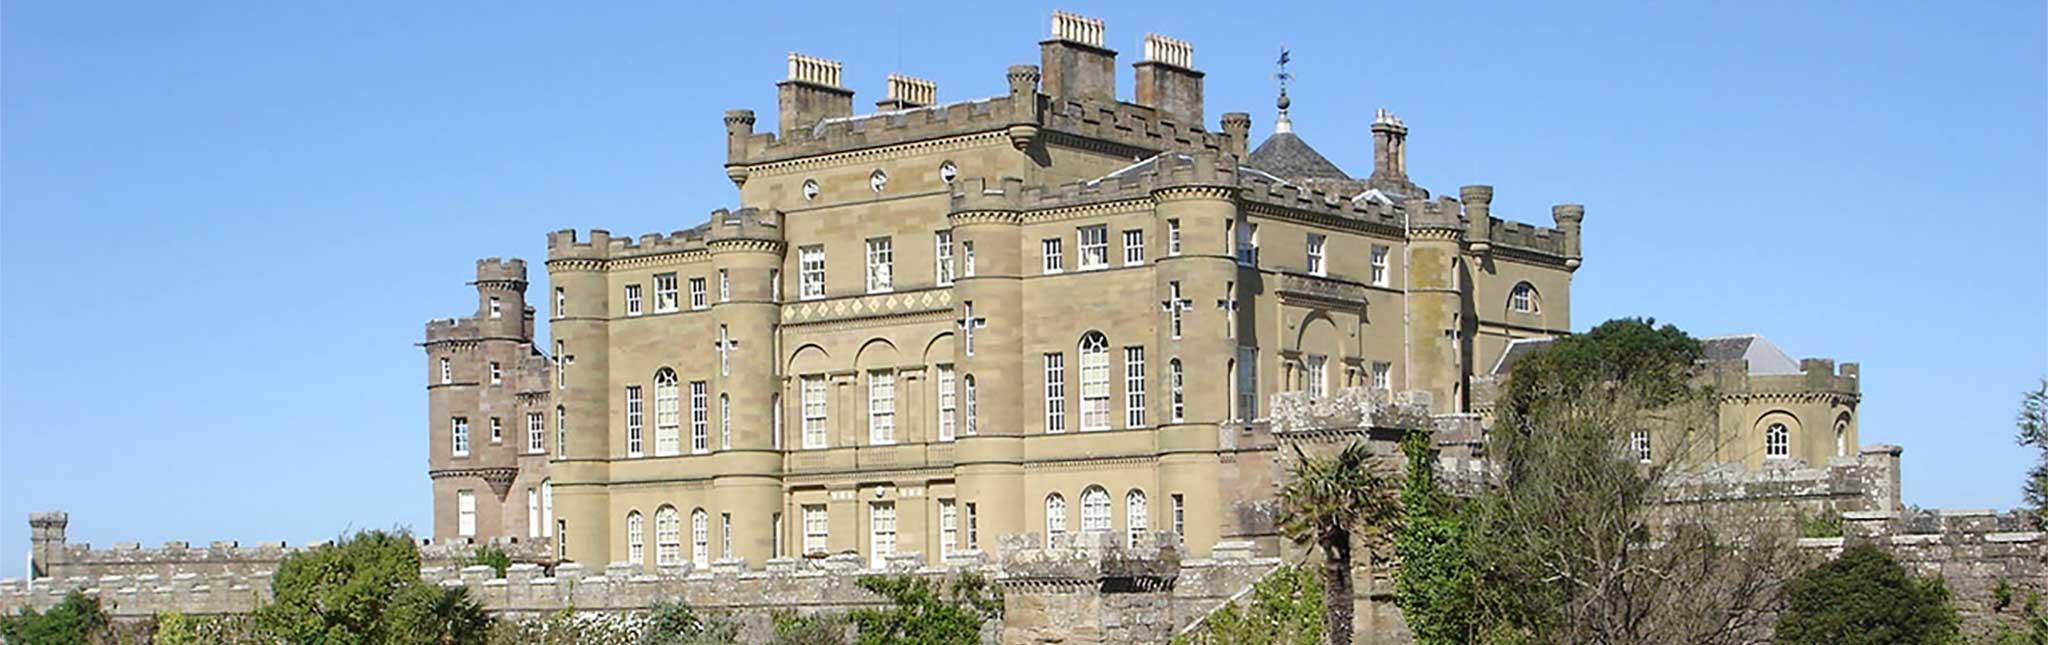 AYRSHIRE_Culzean_Castle.jpg